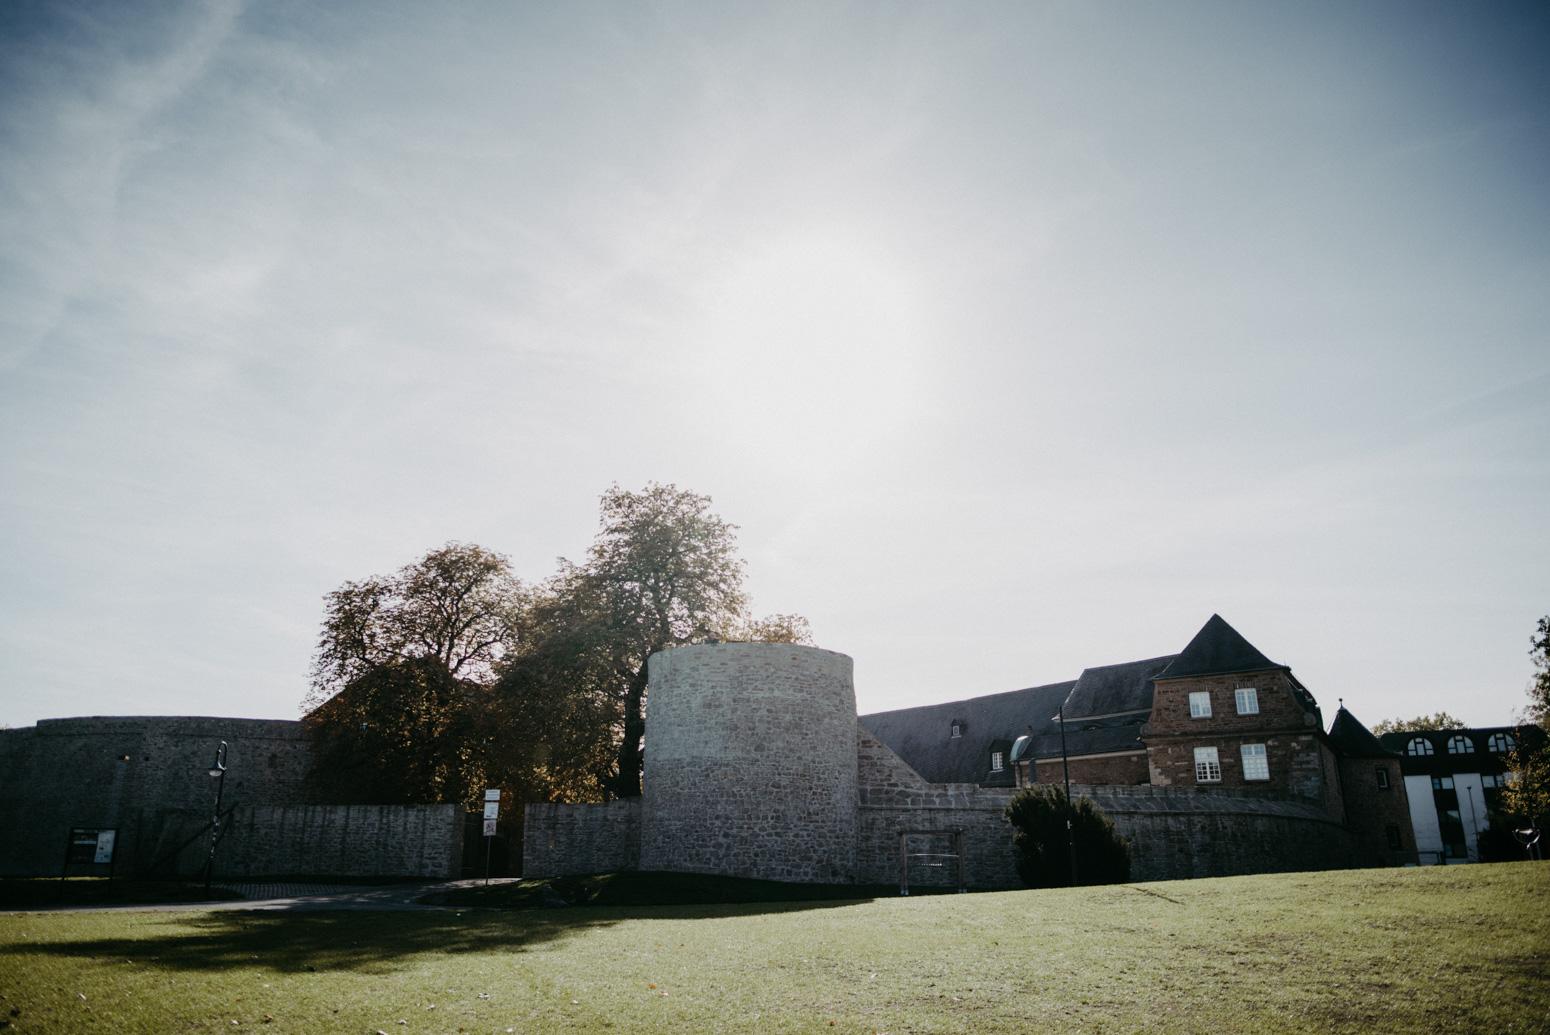 Schloss Broich, Mülheim an der Ruhr, Ansicht vom Park